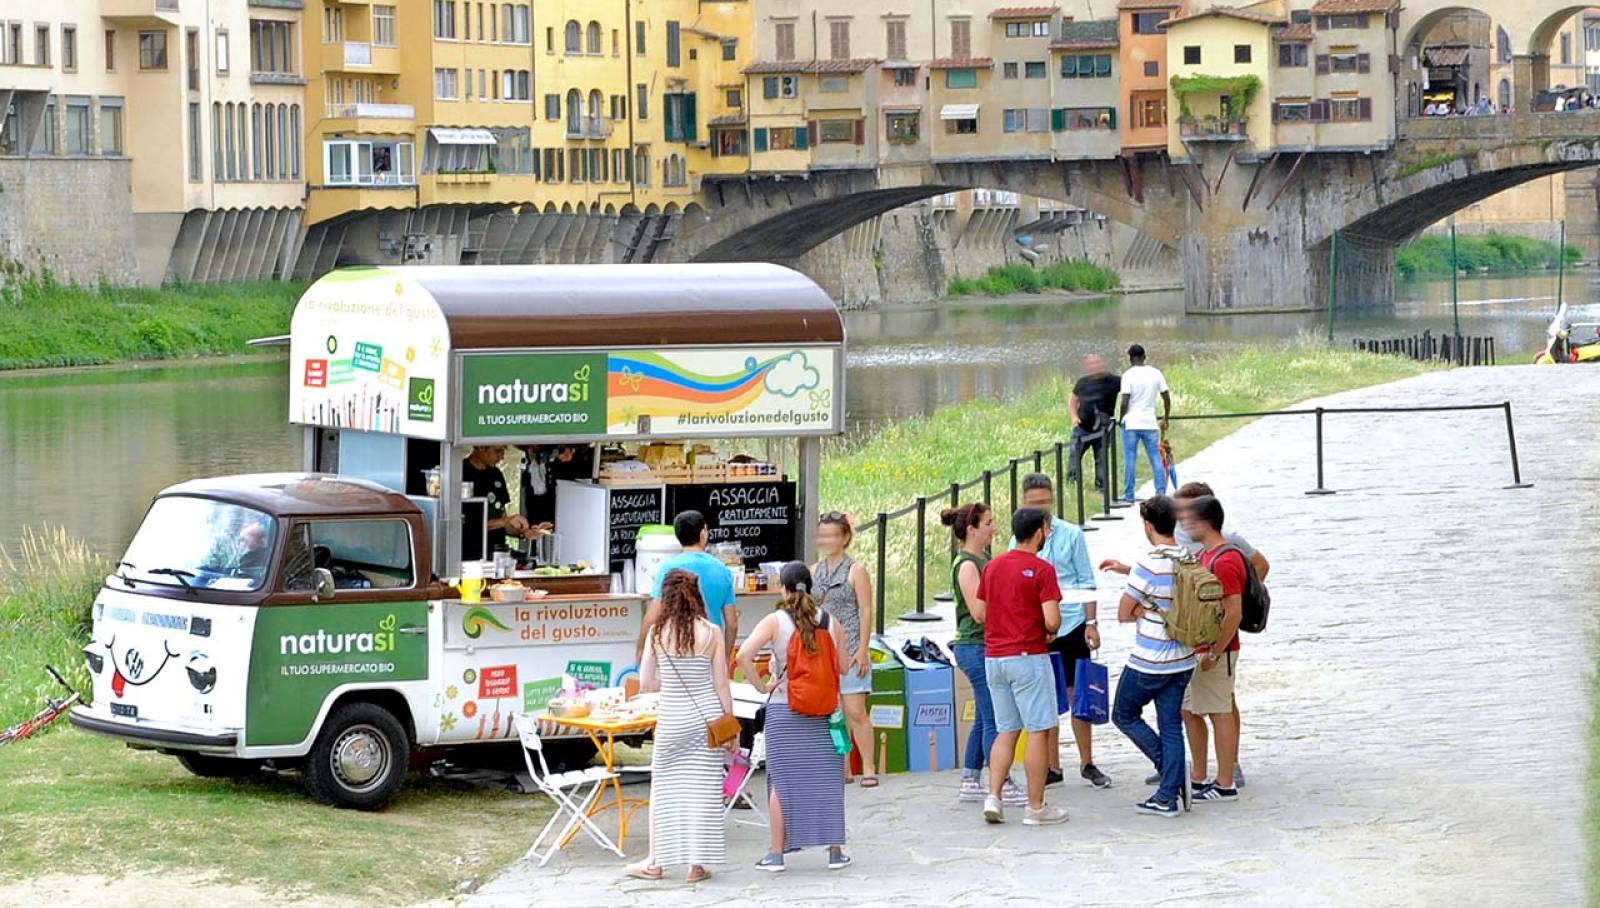 IGPDecaux Firenze Bio Van per NaturaSì